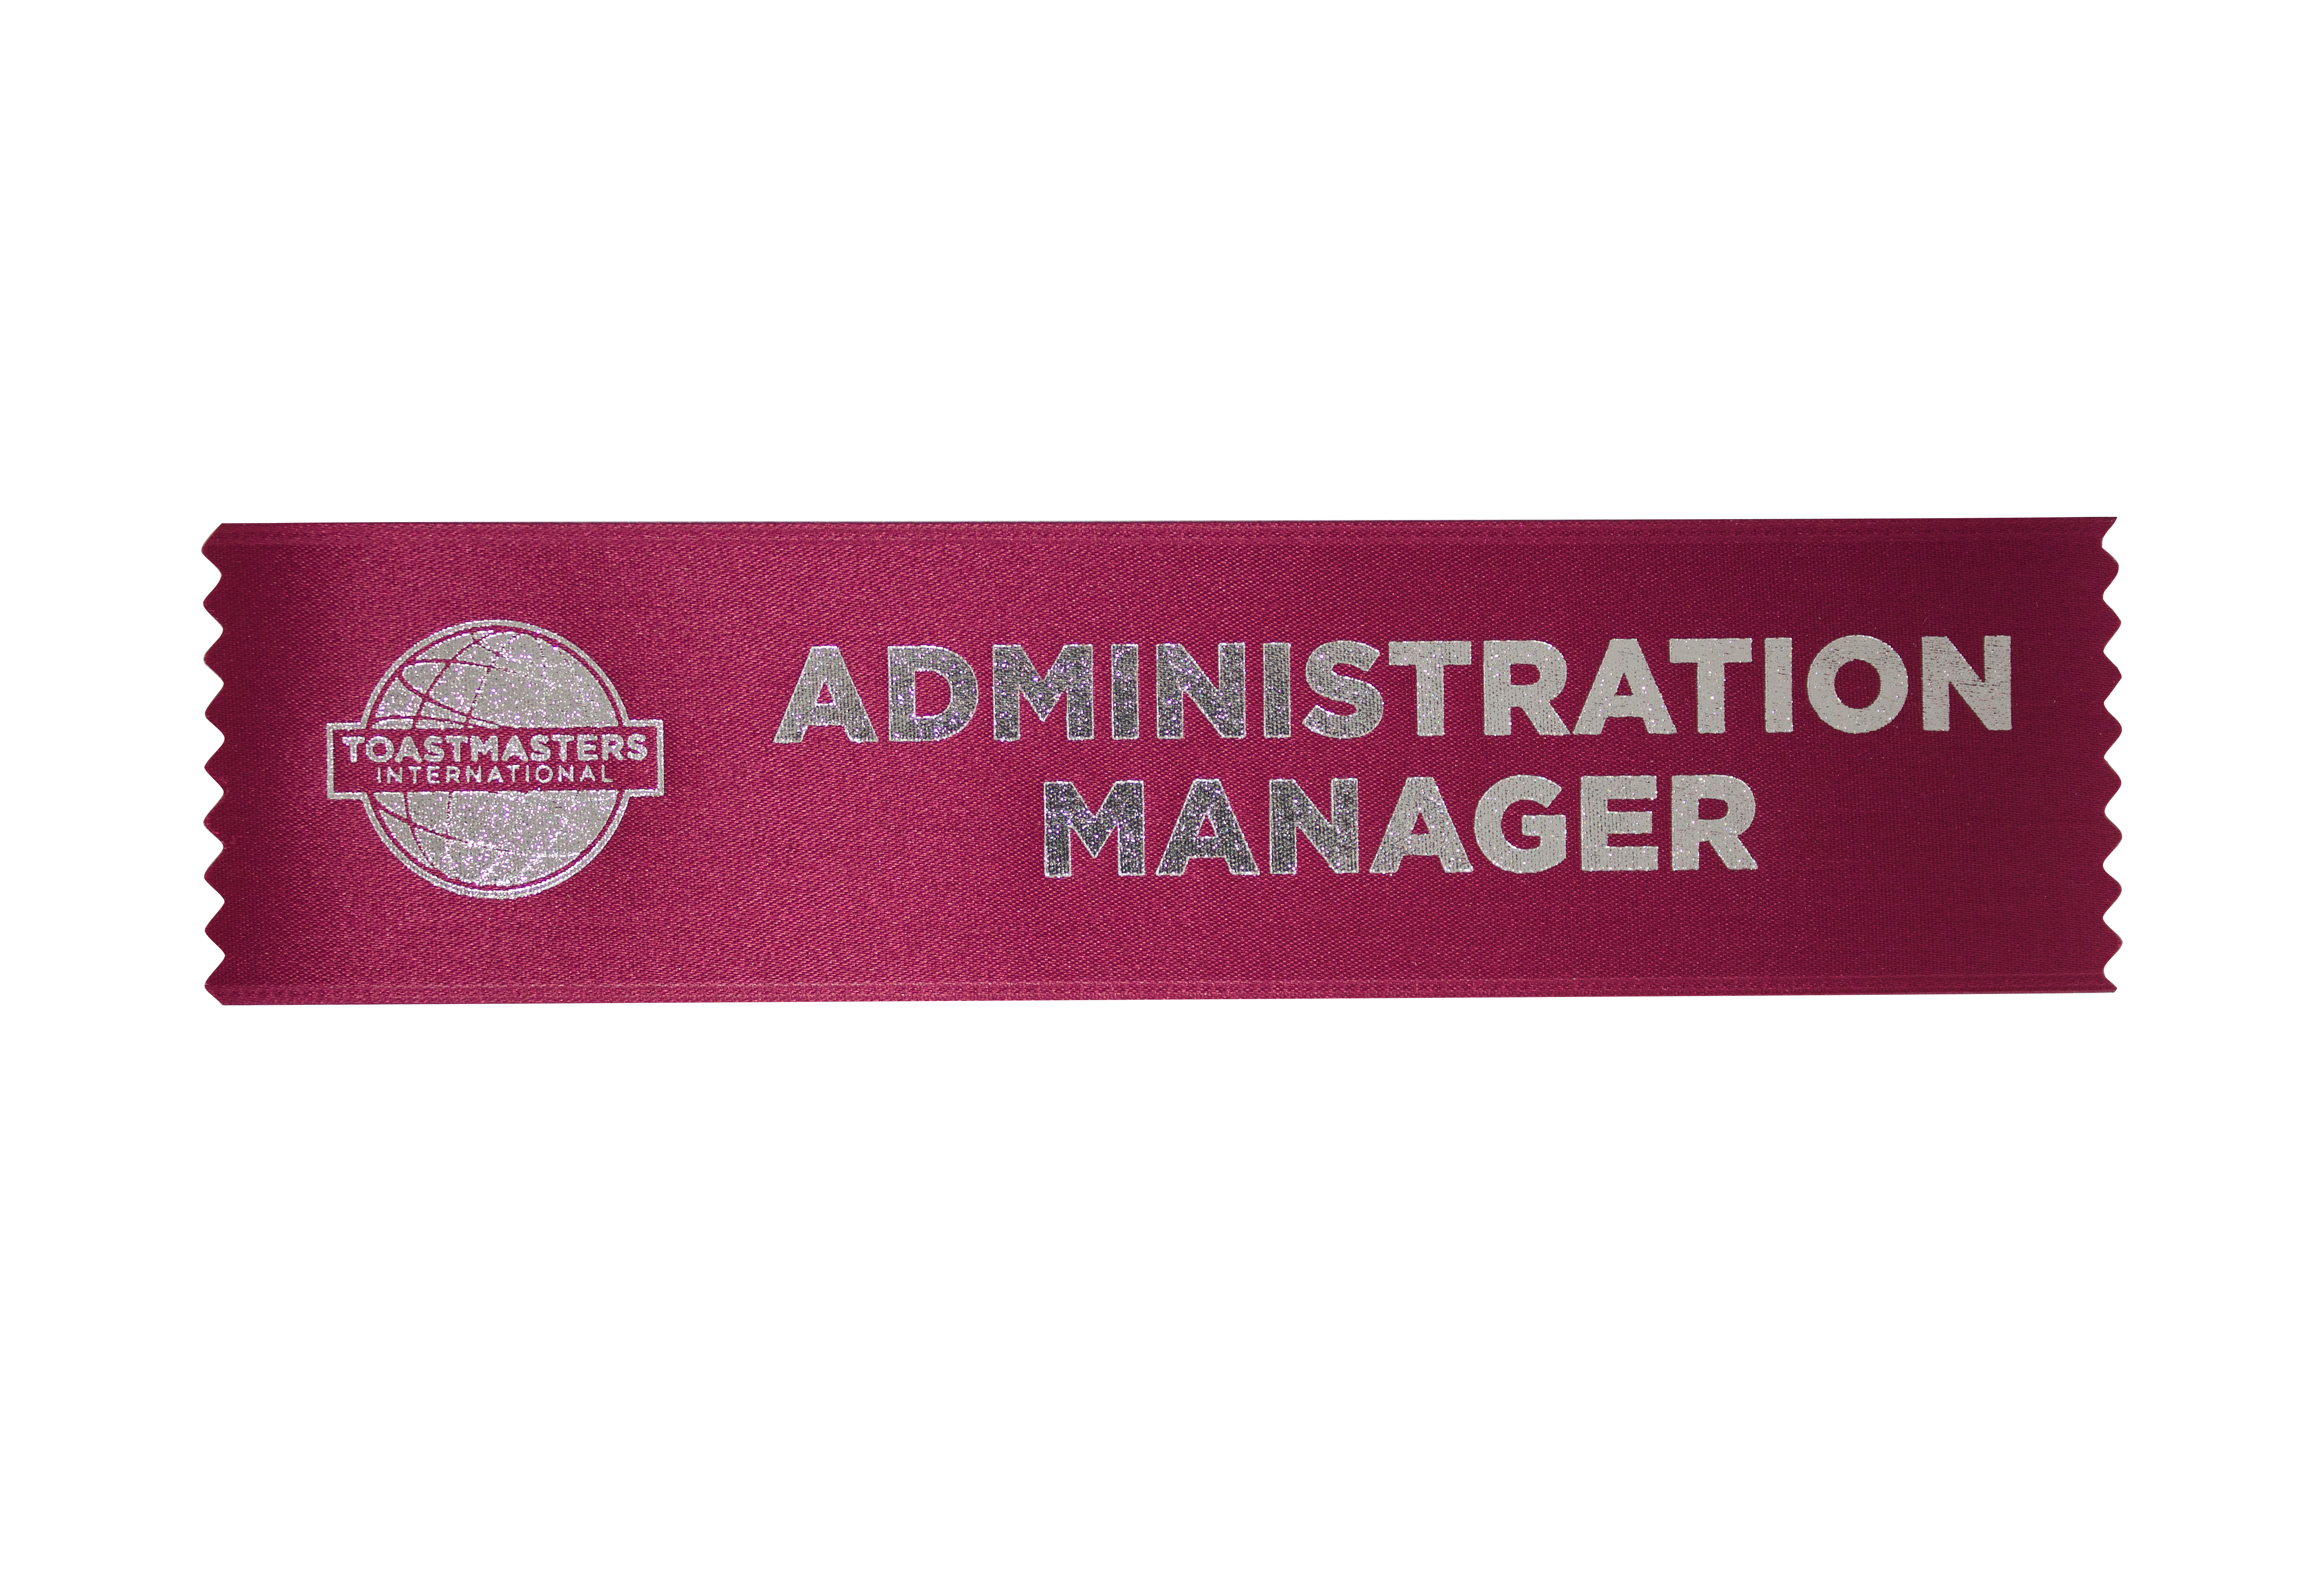 Administration Manager Ribbon